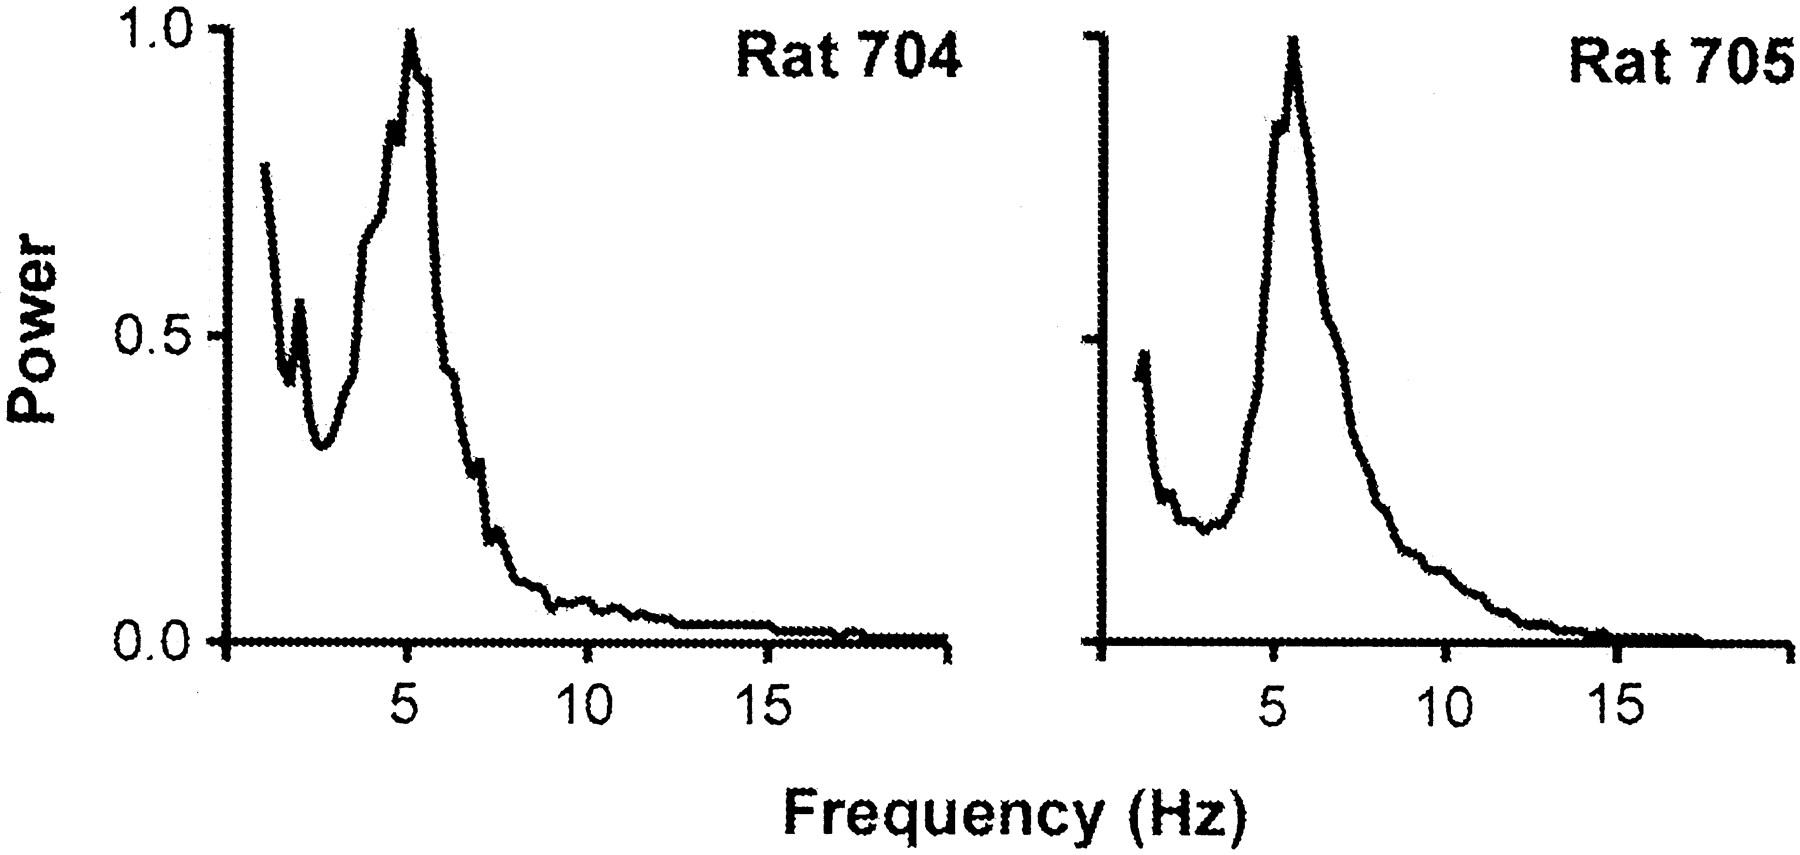 Whisker Deafferentation And Rodent Whisking Patterns Behavioral 1956 Dj 3a Willys Wiring Diagram Download Figure